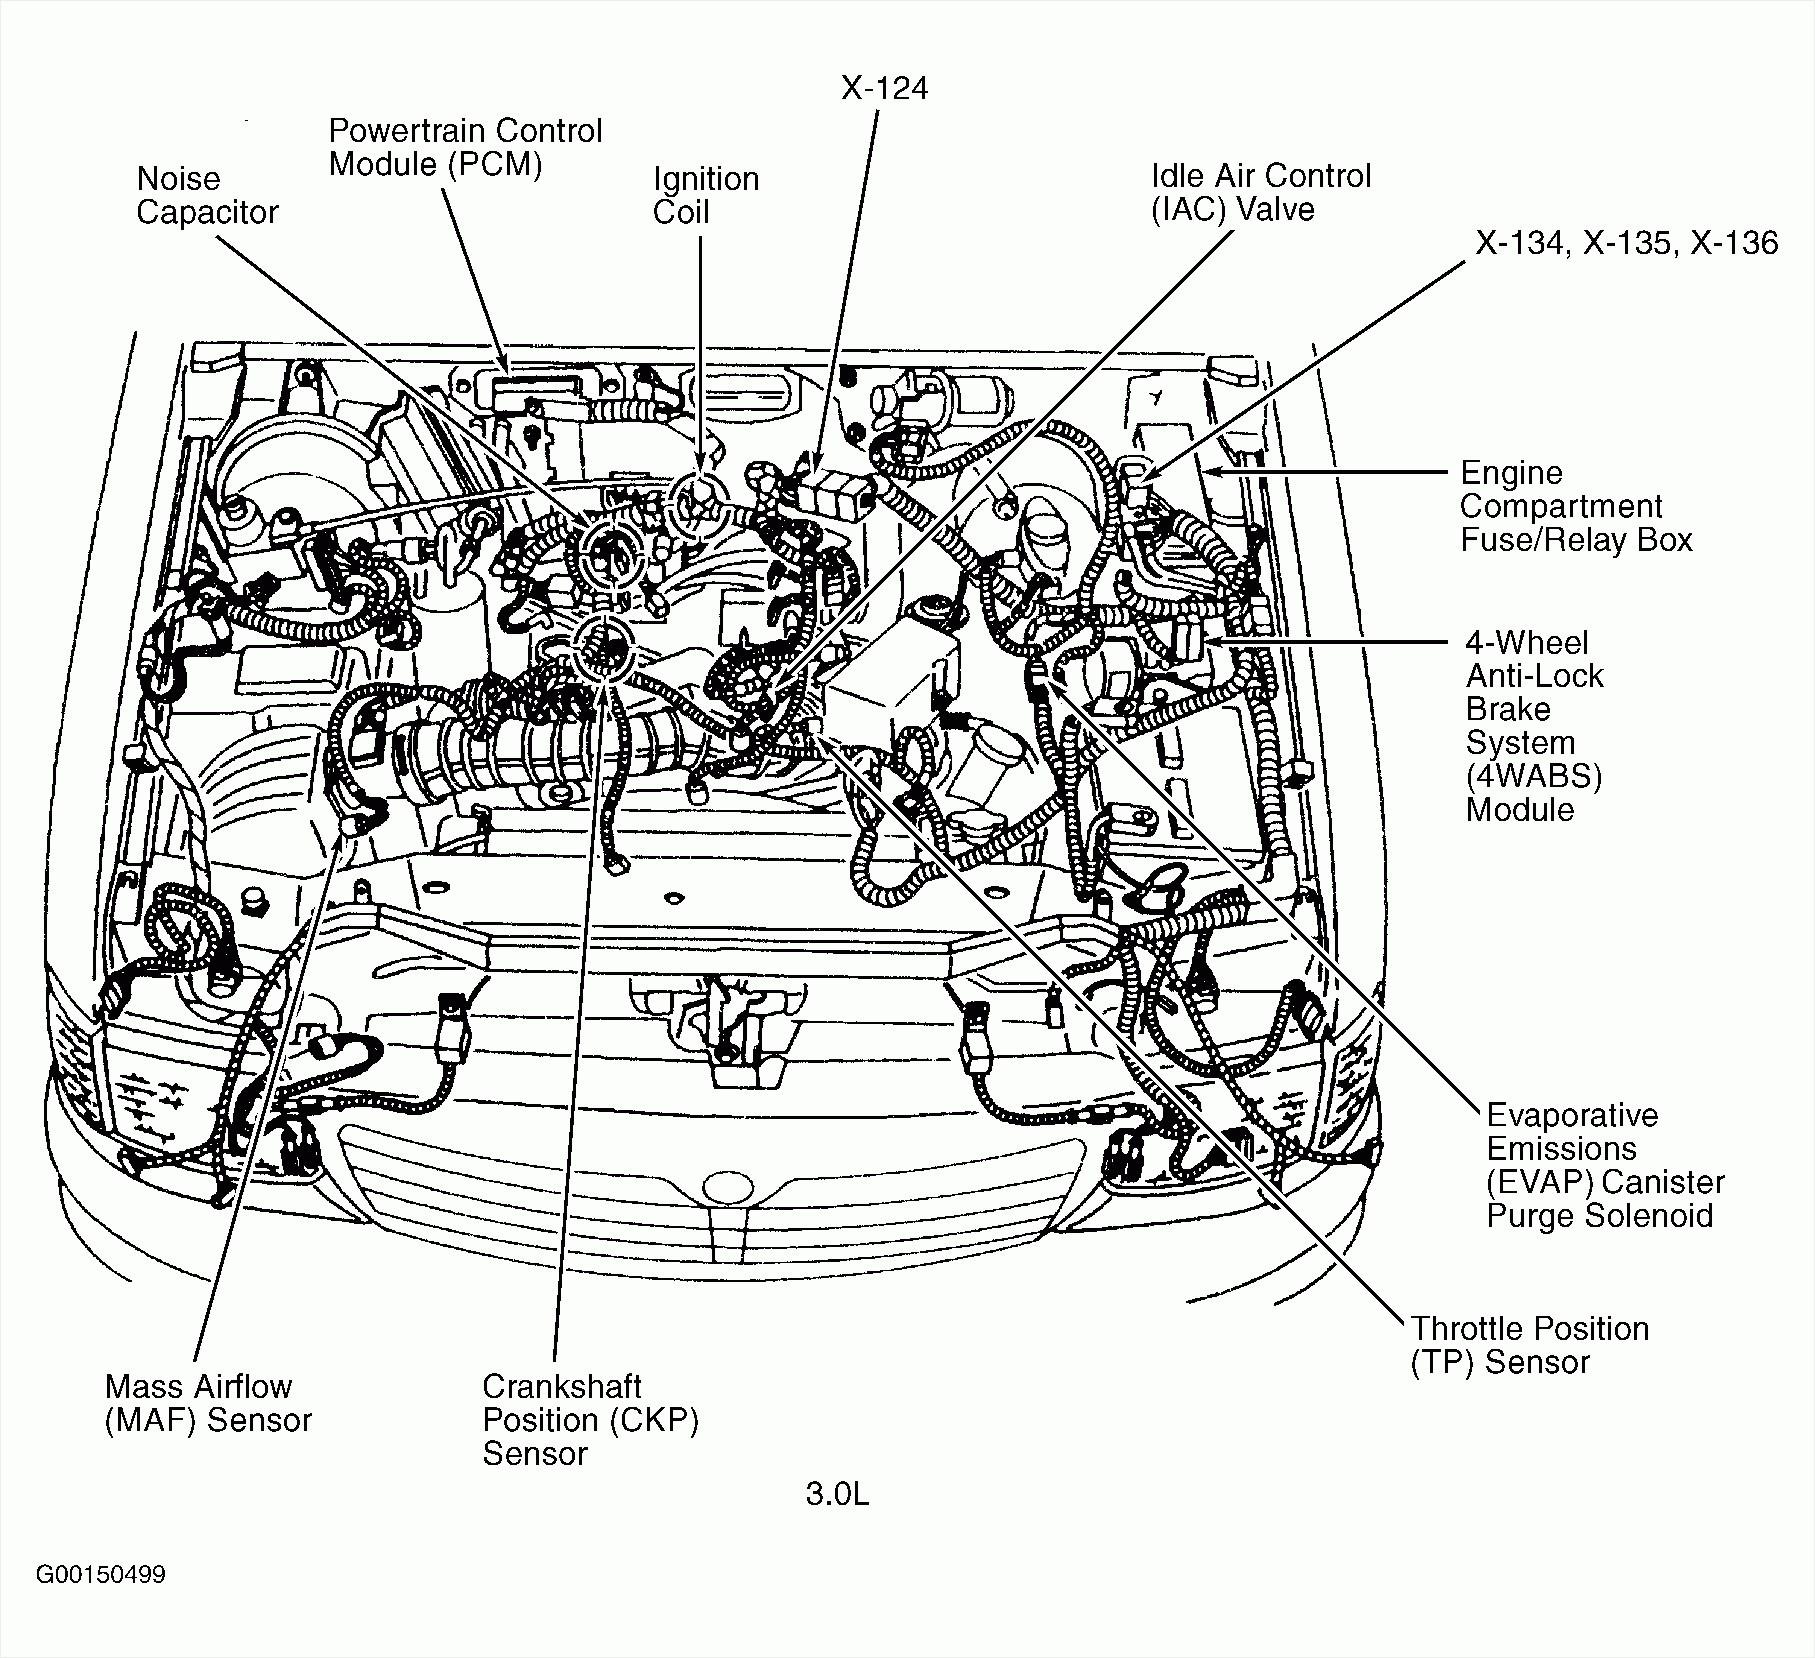 2004 Mazda 6 Engine Diagram 3 1 Liter V6 Engine Diagram 2004 Mazda 6 V6 Engine Diagram Wiring Of 2004 Mazda 6 Engine Diagram